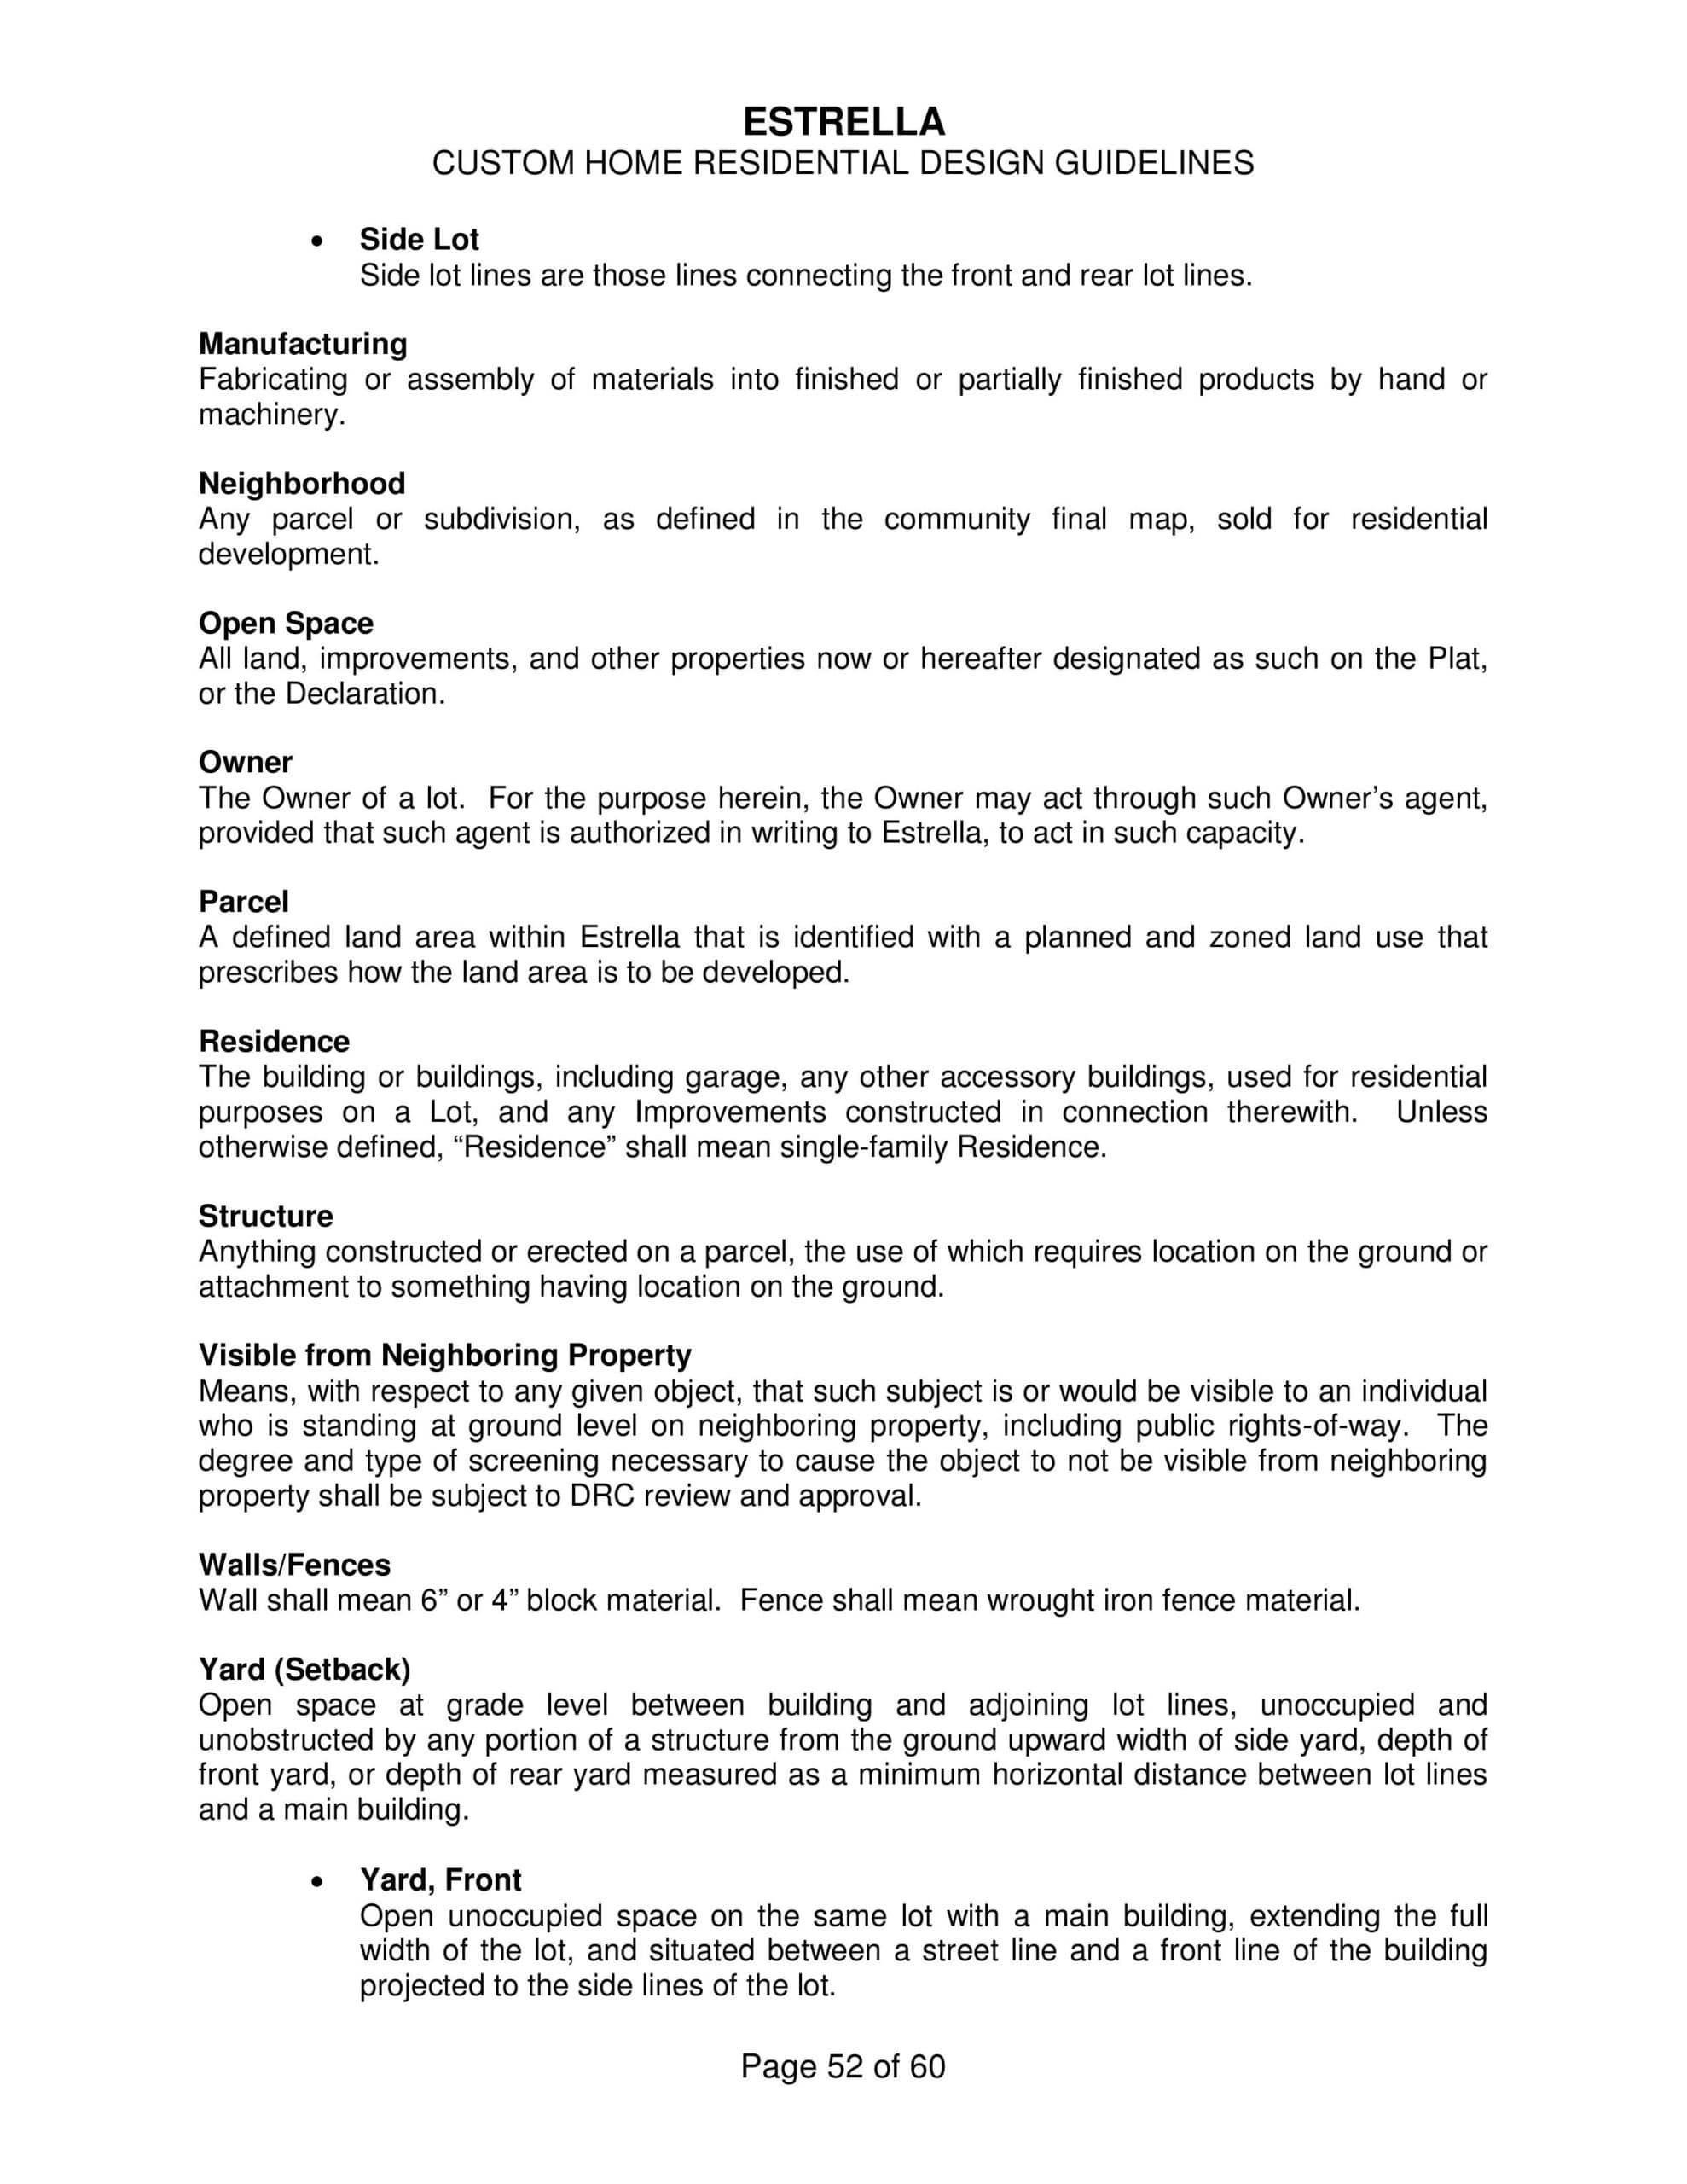 ESTRELLA MOUNTAIN CUSTOM HOME GUIDELINES-page-056